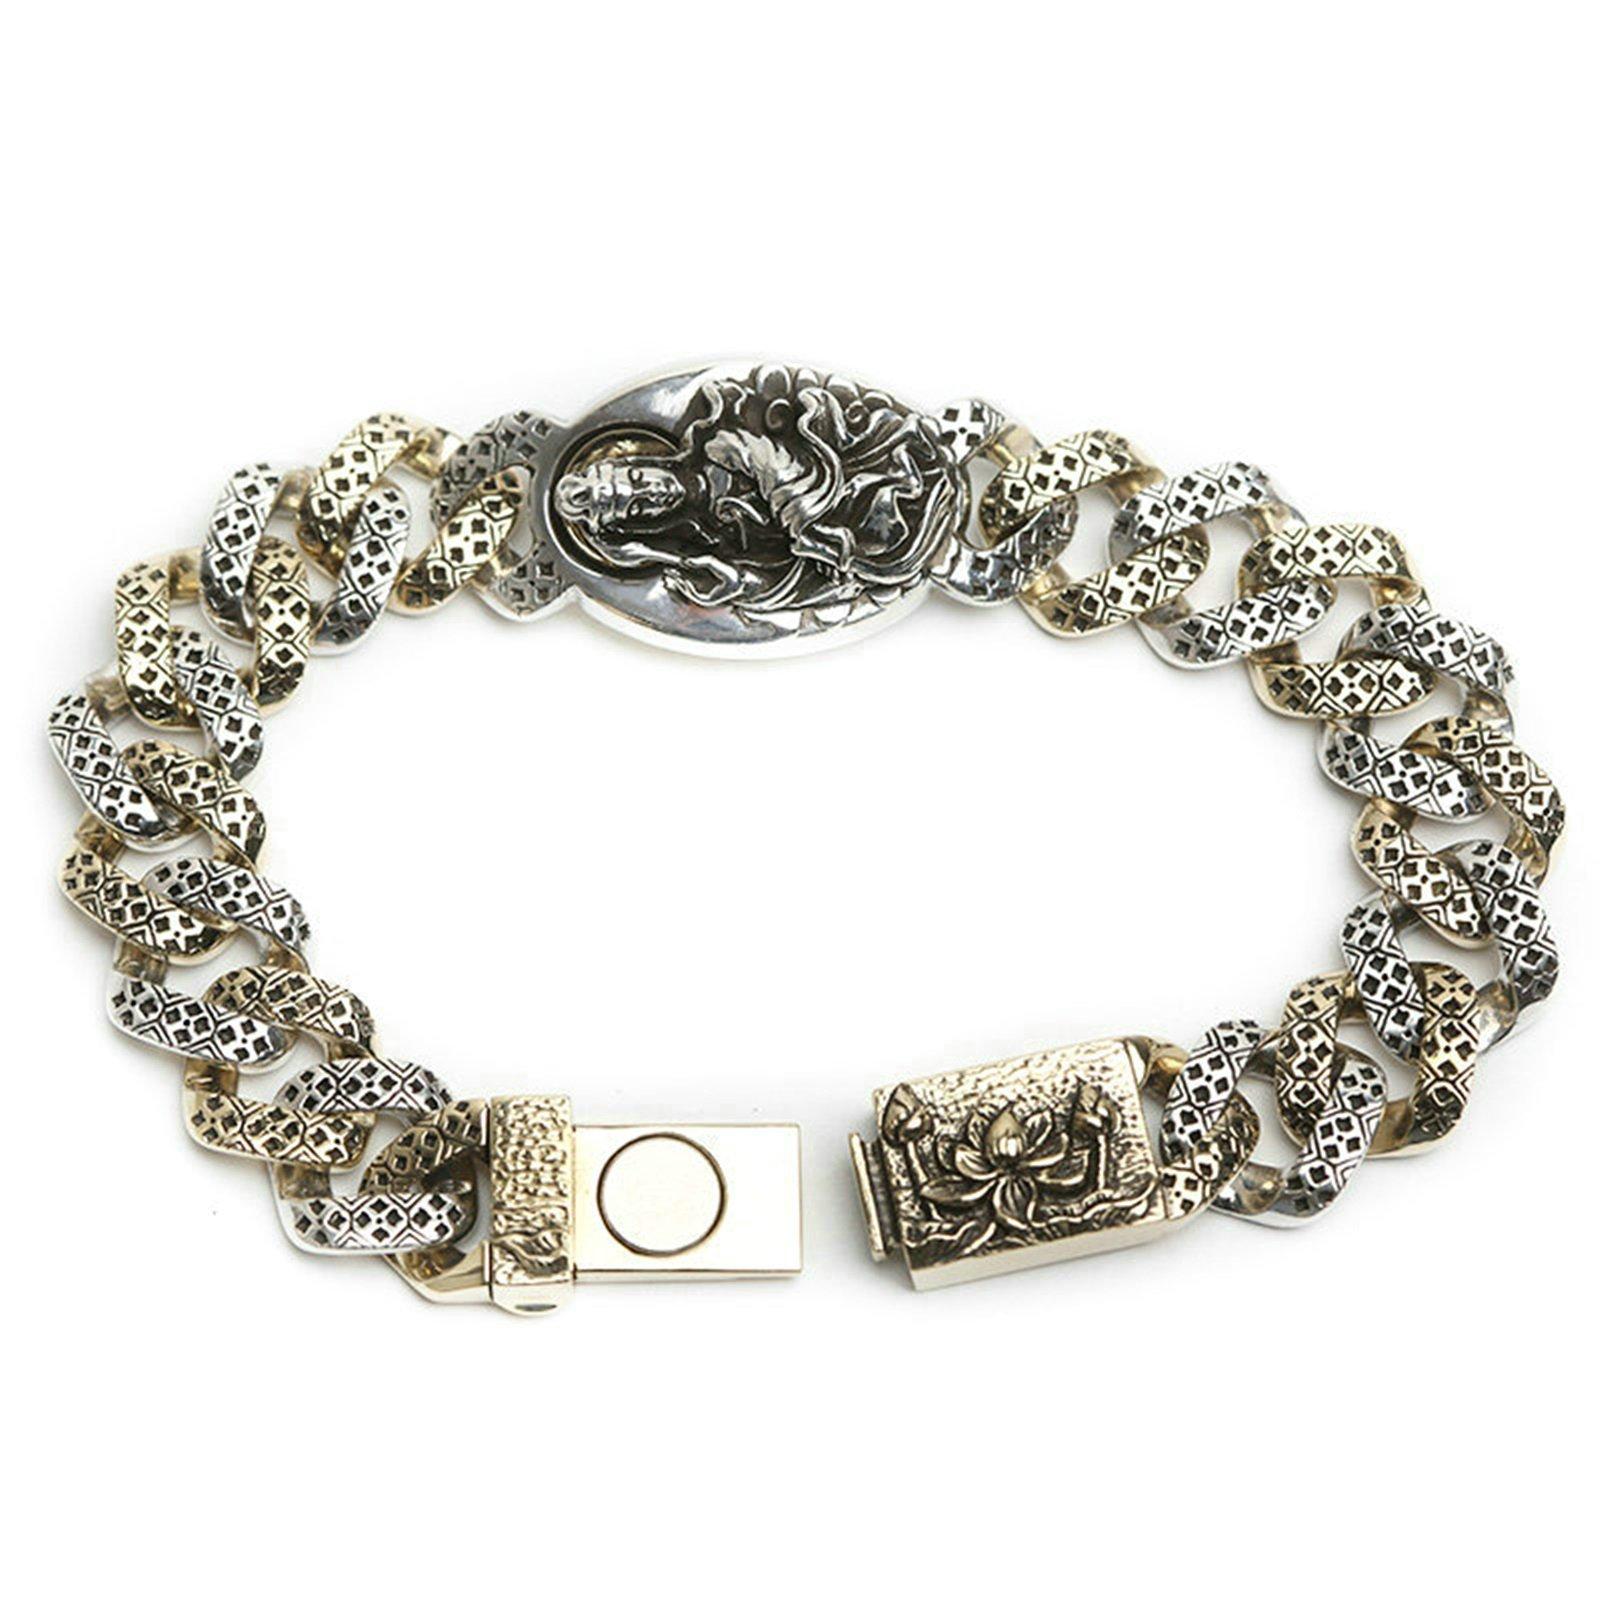 Daesar 925 Silver Bracelet For Women Guanyin Lotus Bracelet Silver Chain Length:21CM by Daesar